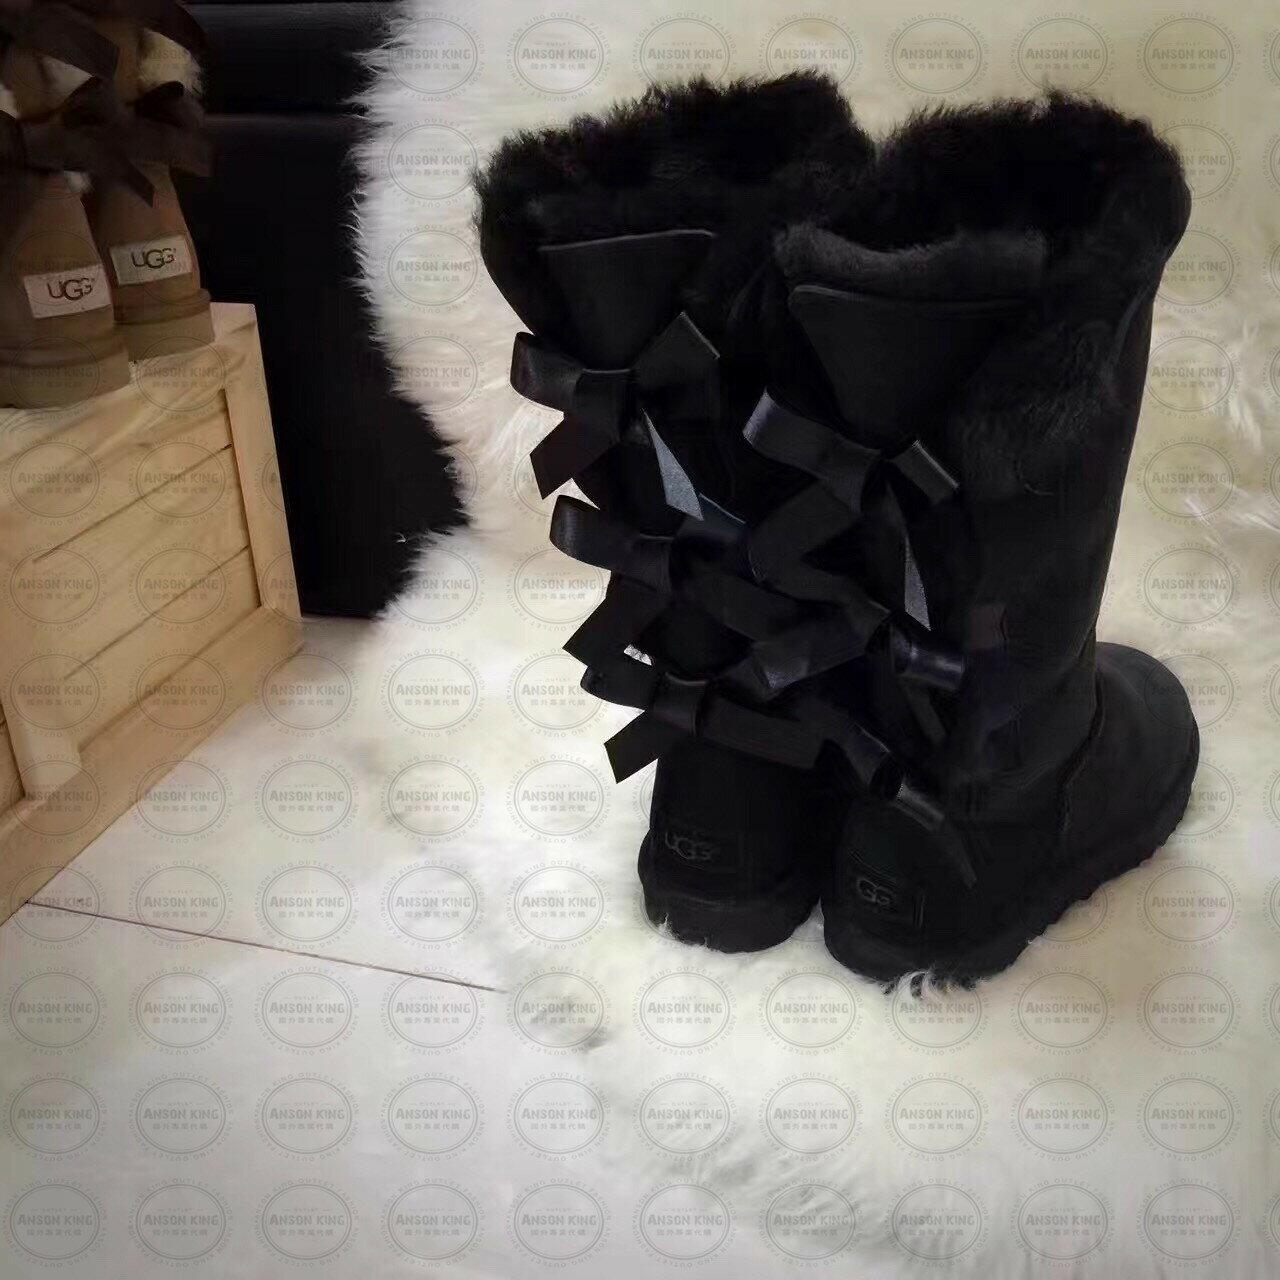 OUTLET正品代購 澳洲 UGG 一體女式絲帶蝴蝶結 保暖 真皮羊皮毛 雪靴 短靴 黑色 2